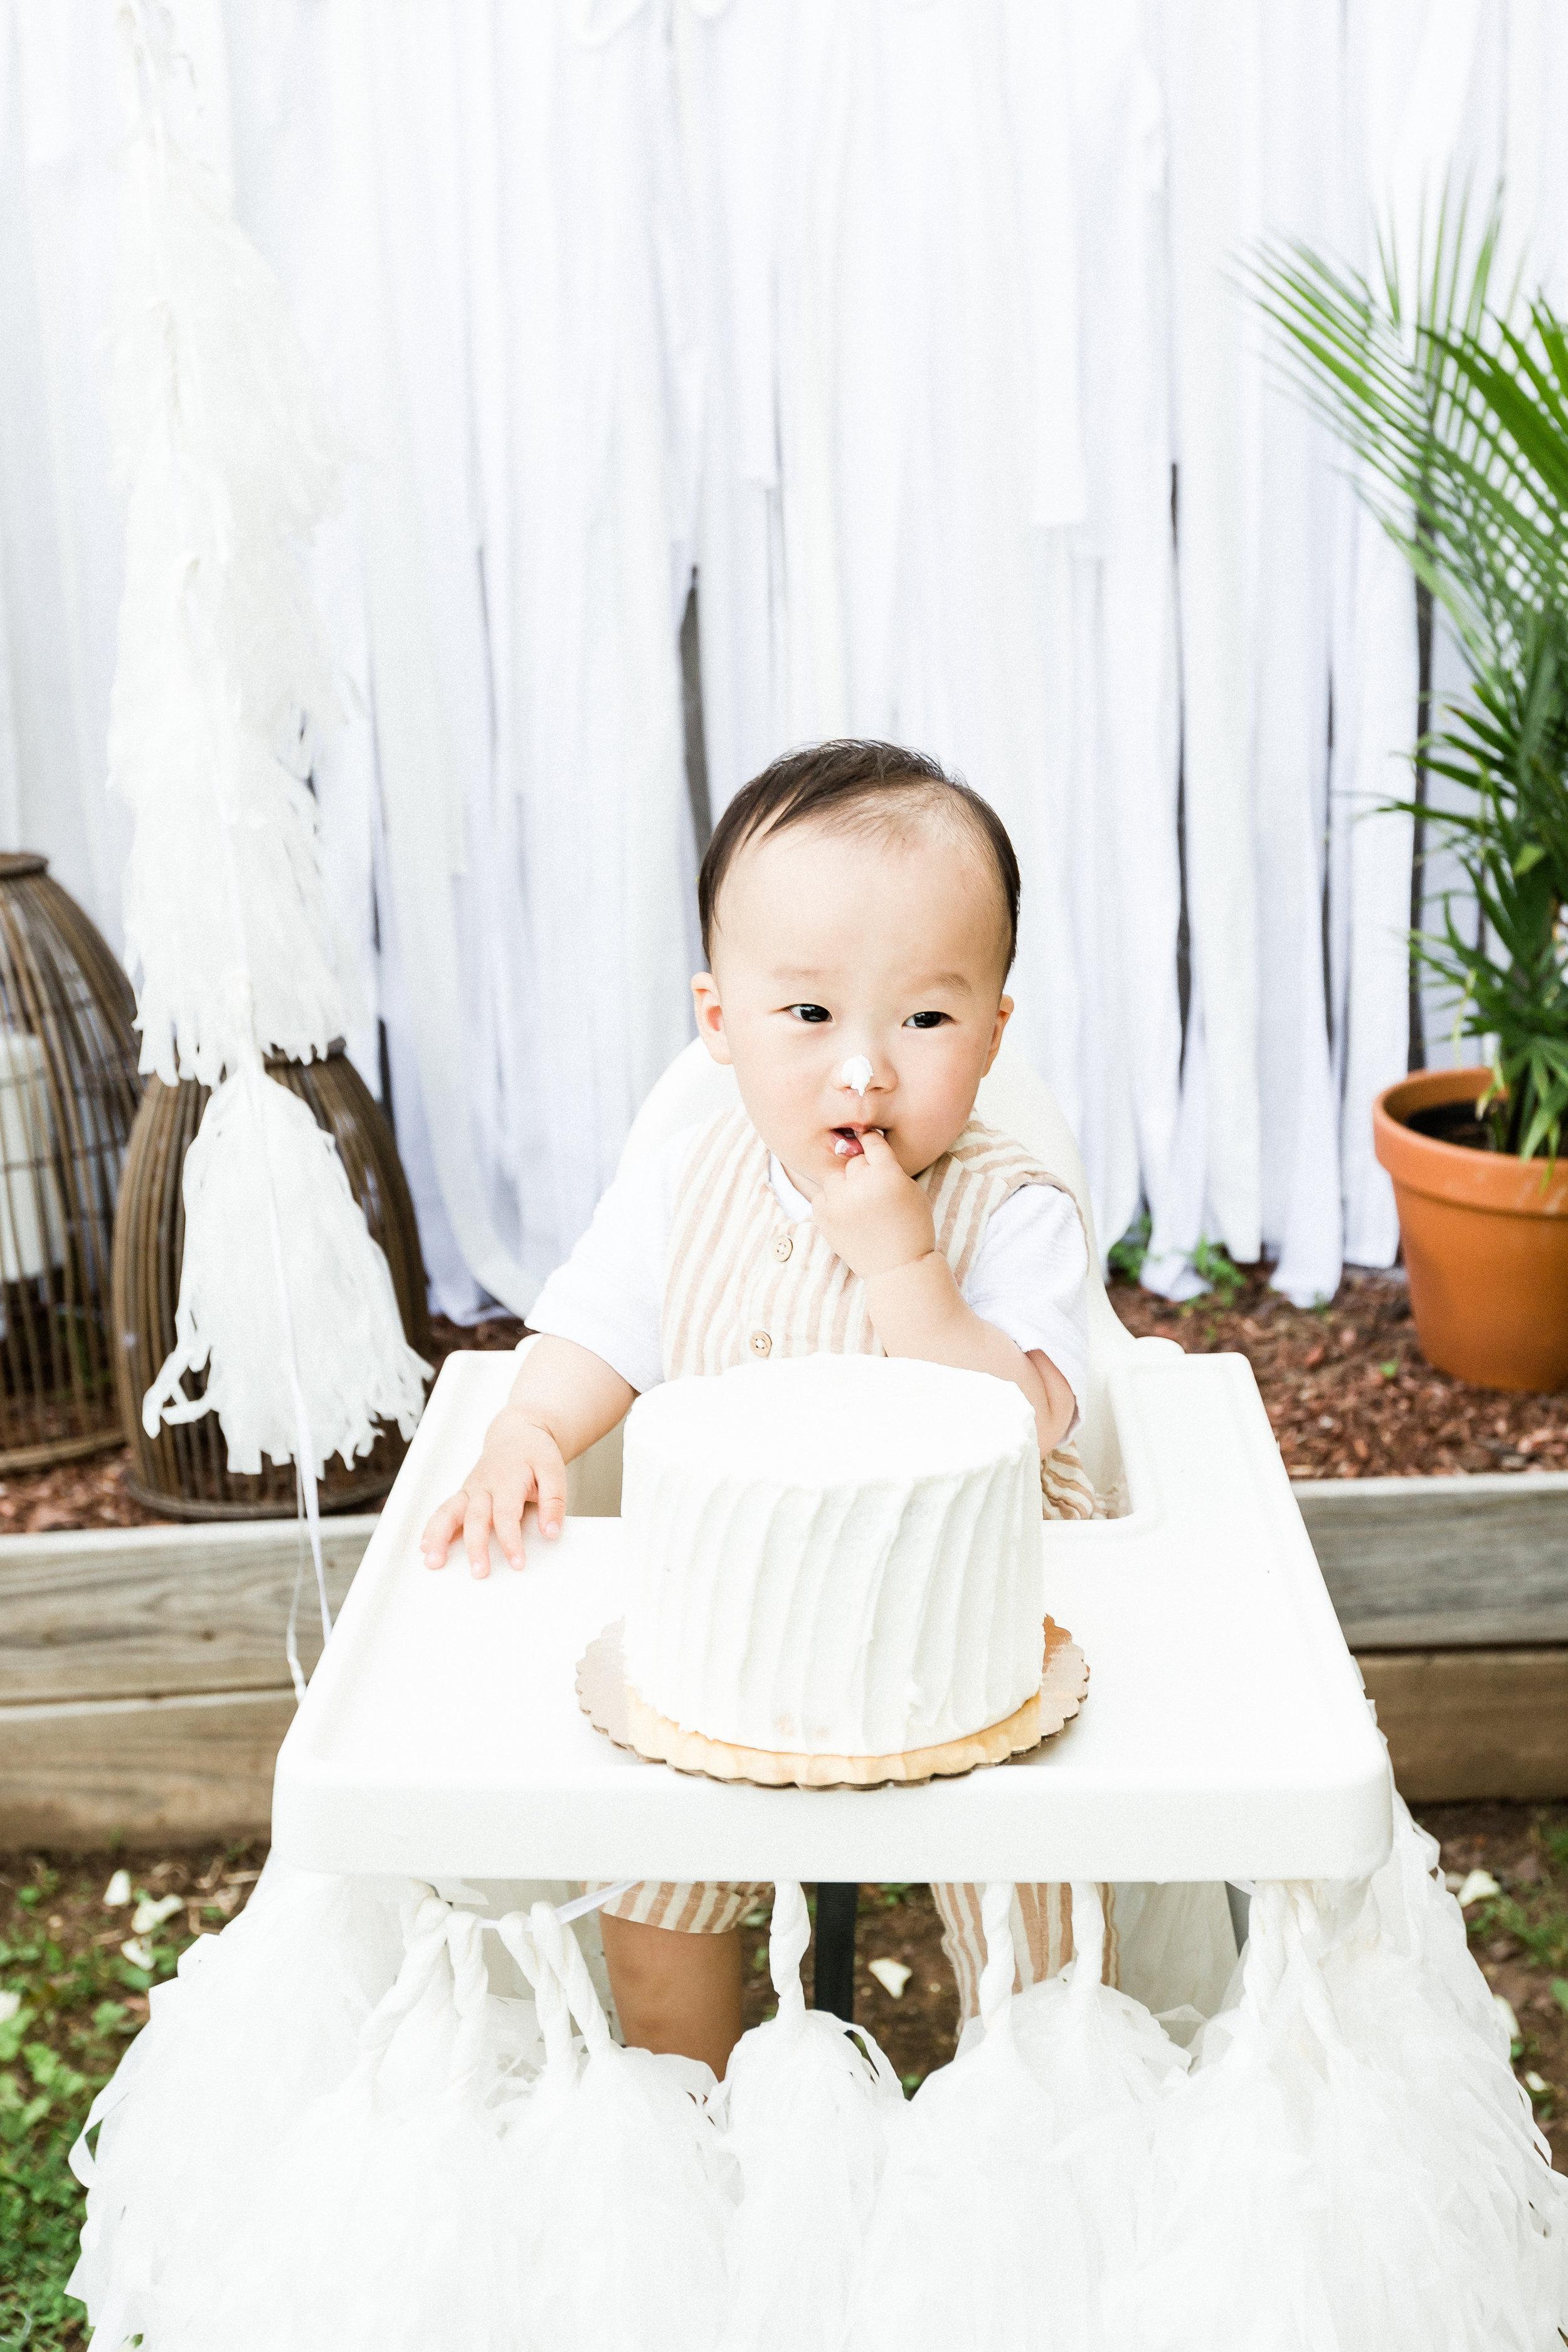 lissie-loomis-photo-nyc-family-photographer-brooklyn-baby54.JPG